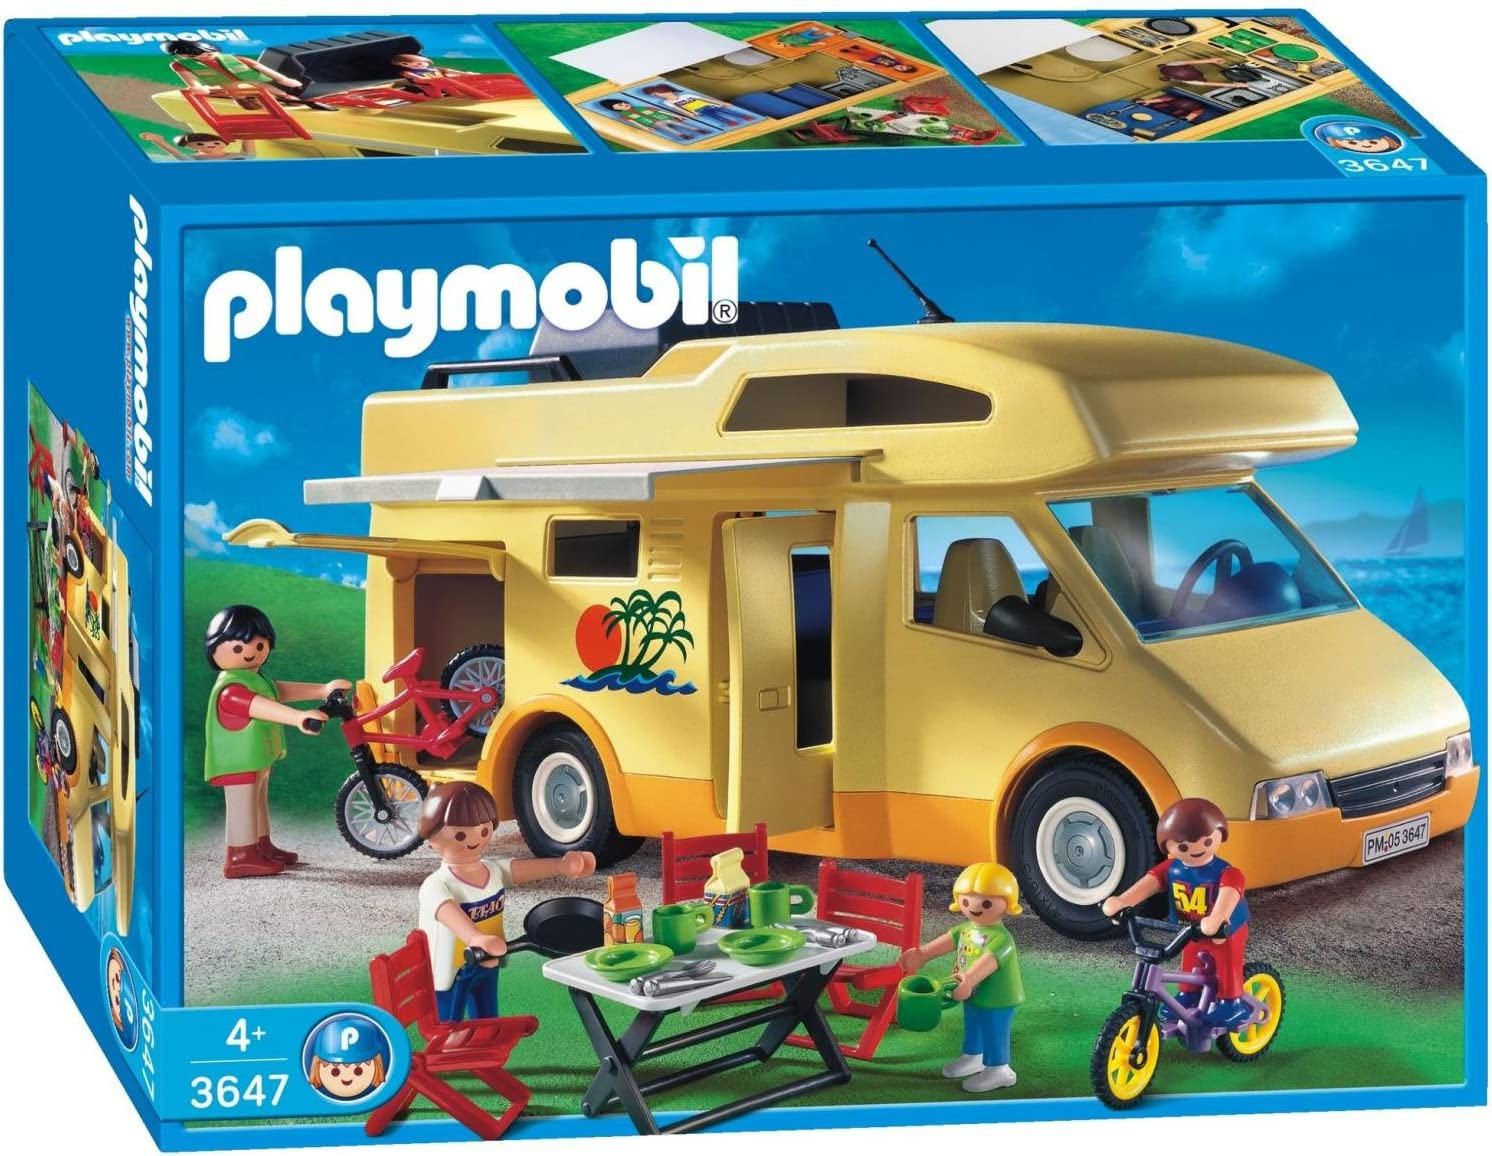 Playmobil 599386031 - Caravana de Vacaciones: Amazon.es: Juguetes ...